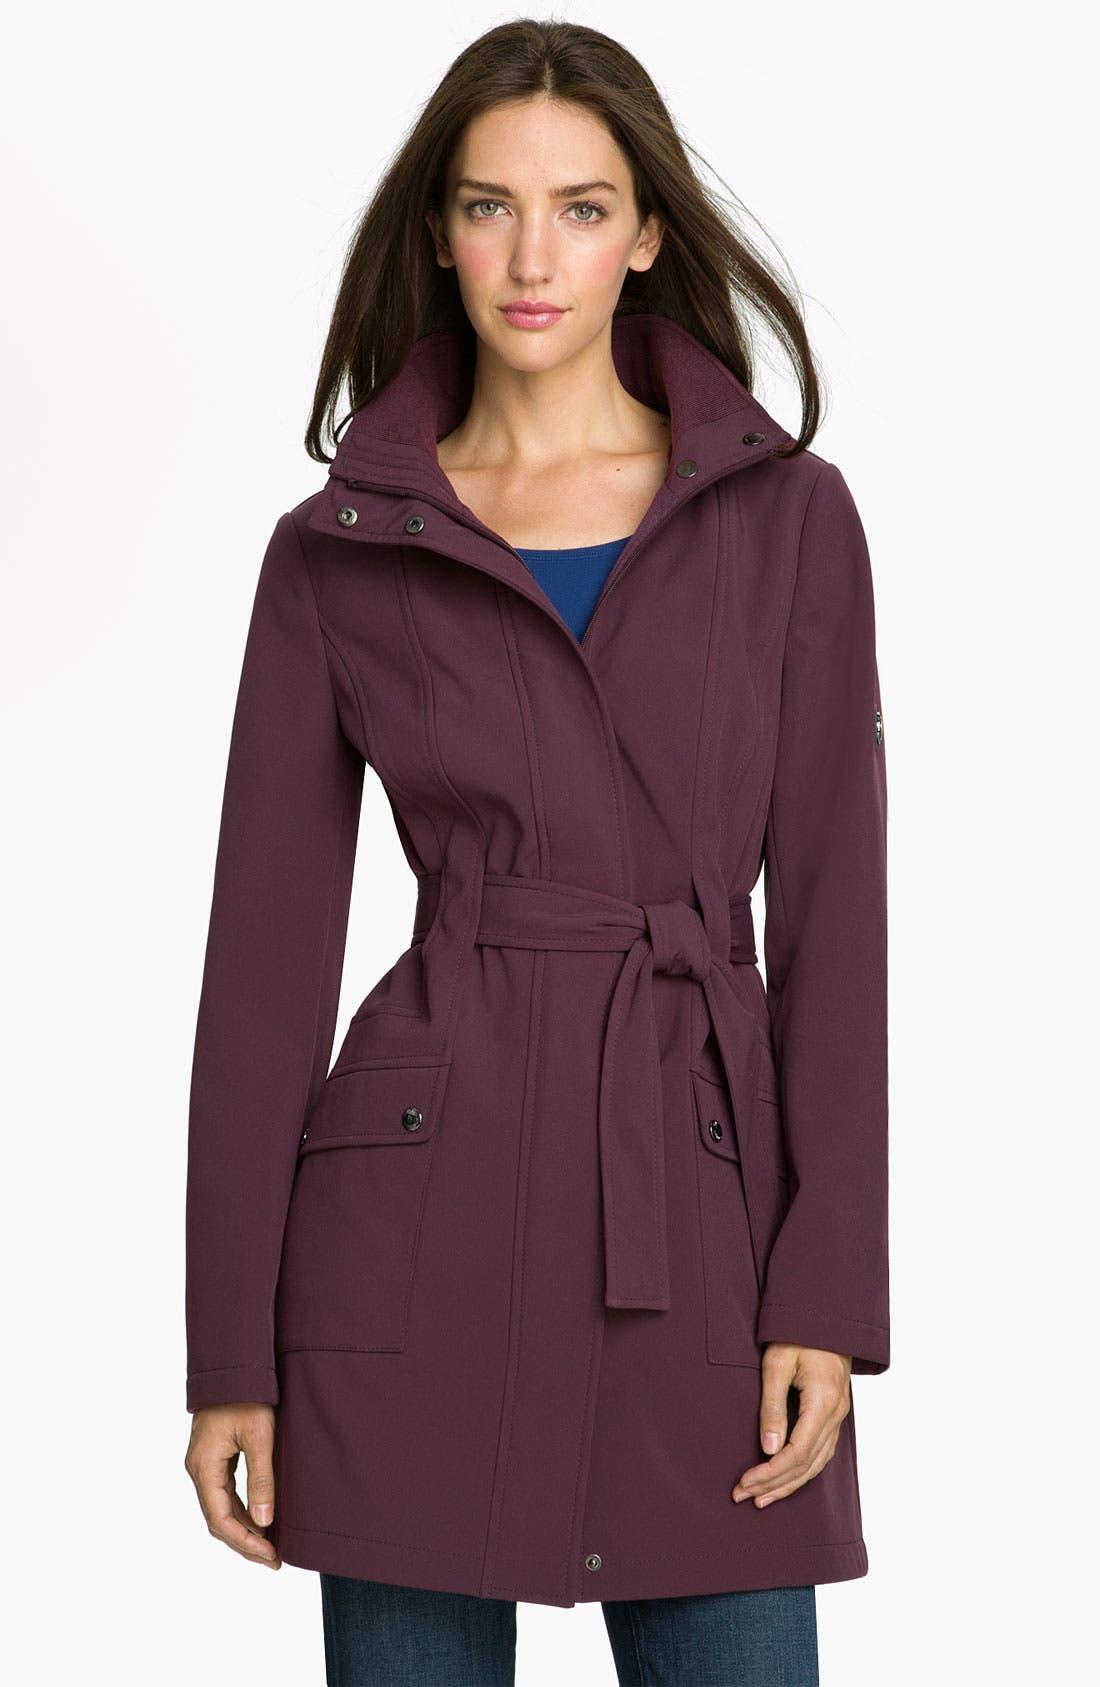 Main Image - Calvin Klein Fleece Lined Coat with Detachable Hood